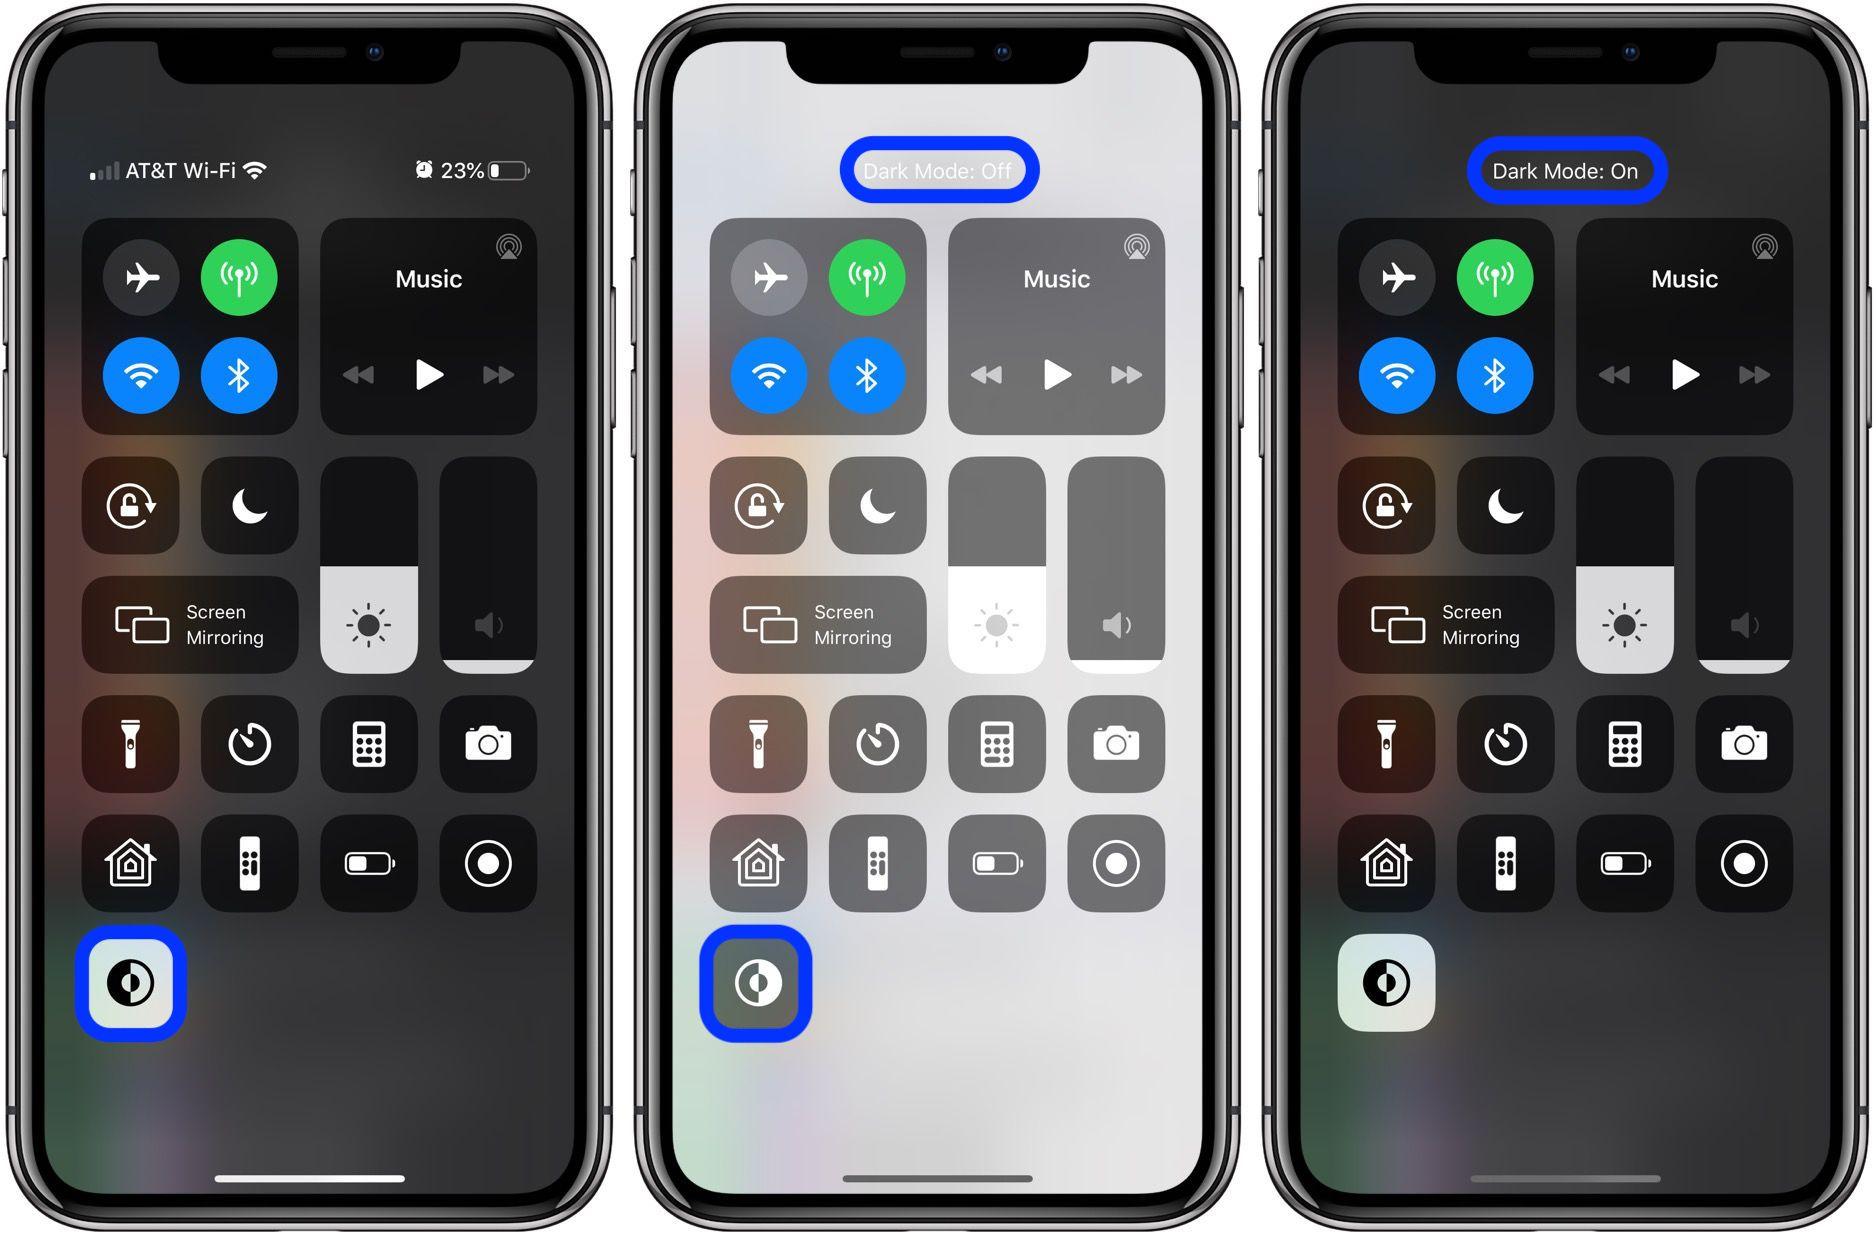 iOS 13 How to add Dark Mode Control Center shortcut iPhone walkthrough 2